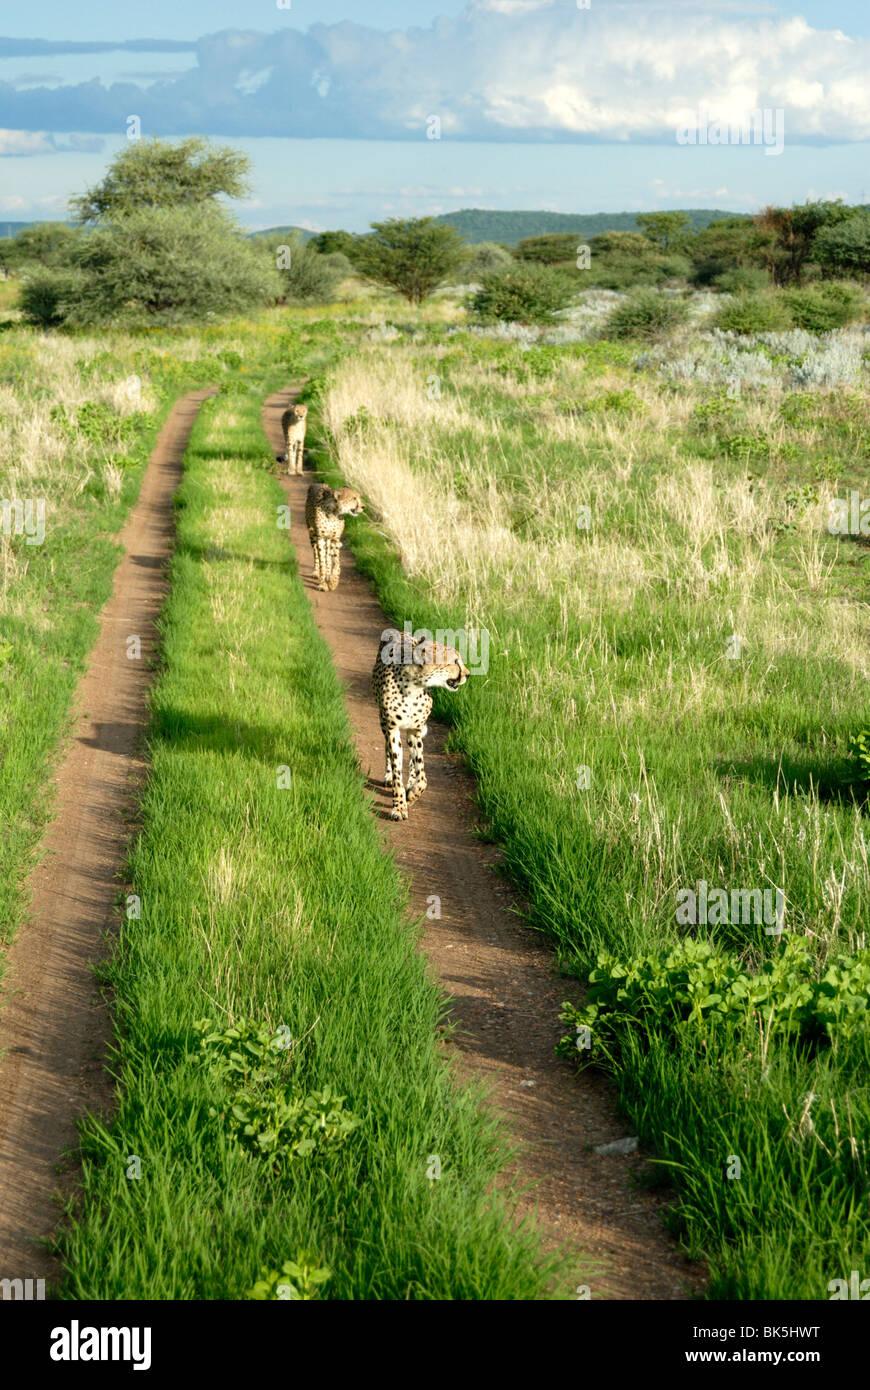 Three cheetahs along path in Etosha National Park, Namibia, Africa - Stock Image